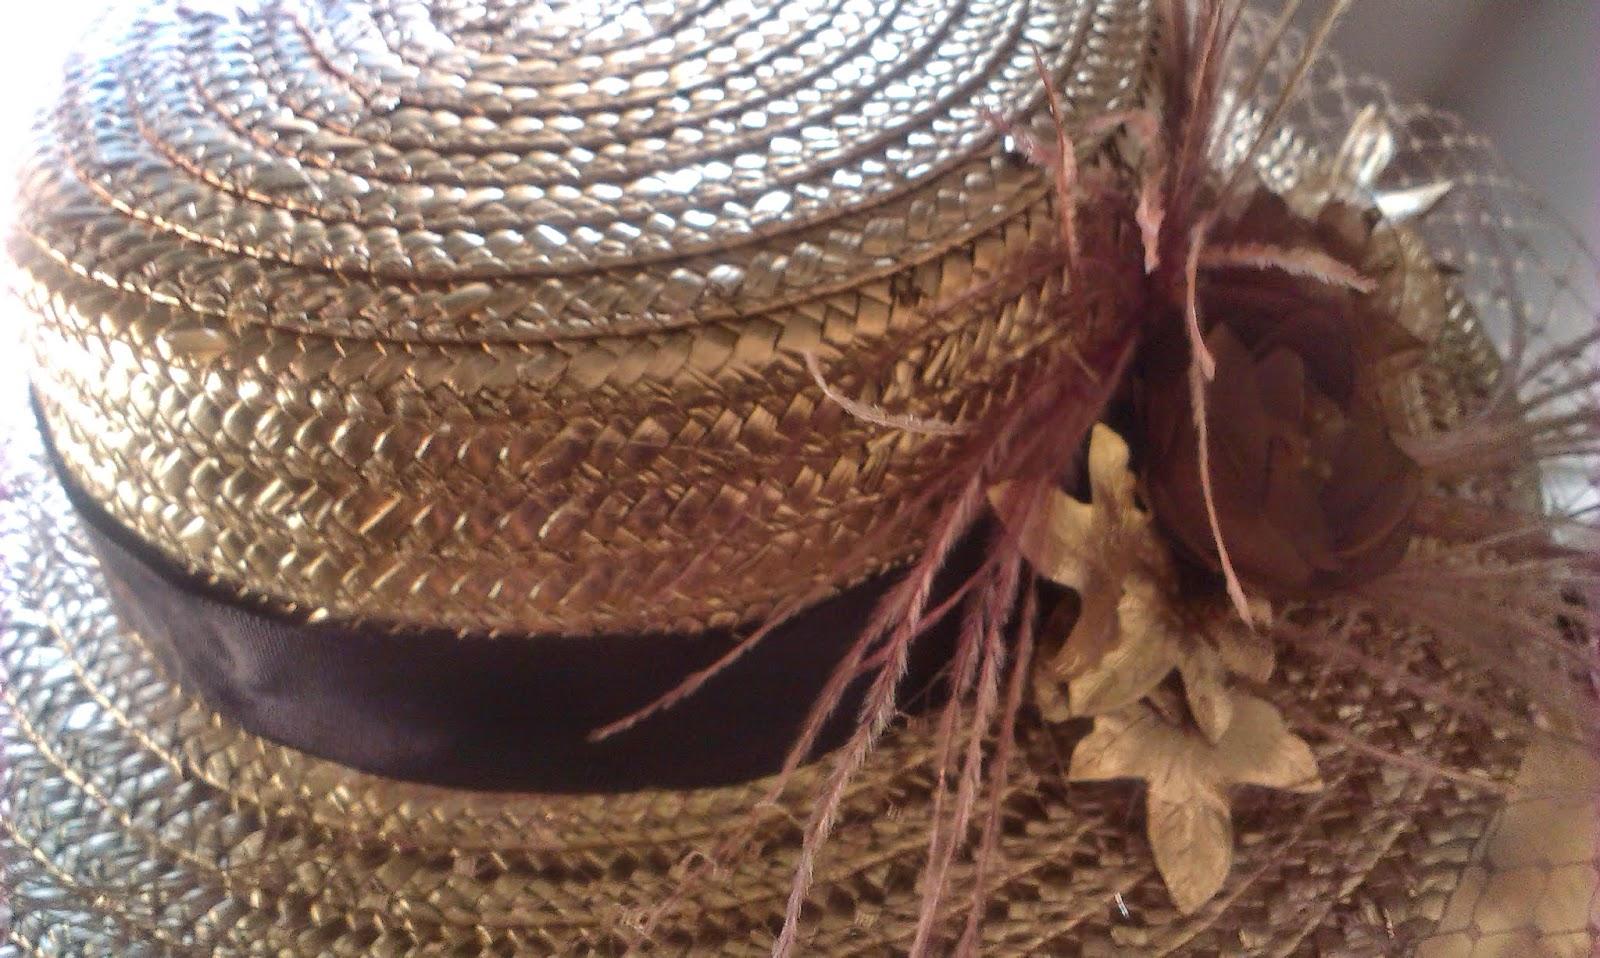 Canotier dorado de copa baja con velo, cinta grossgrain color chocolate, decorado con plumas de avestruz, flores hechas a mano y hojas de eucalipto doradas